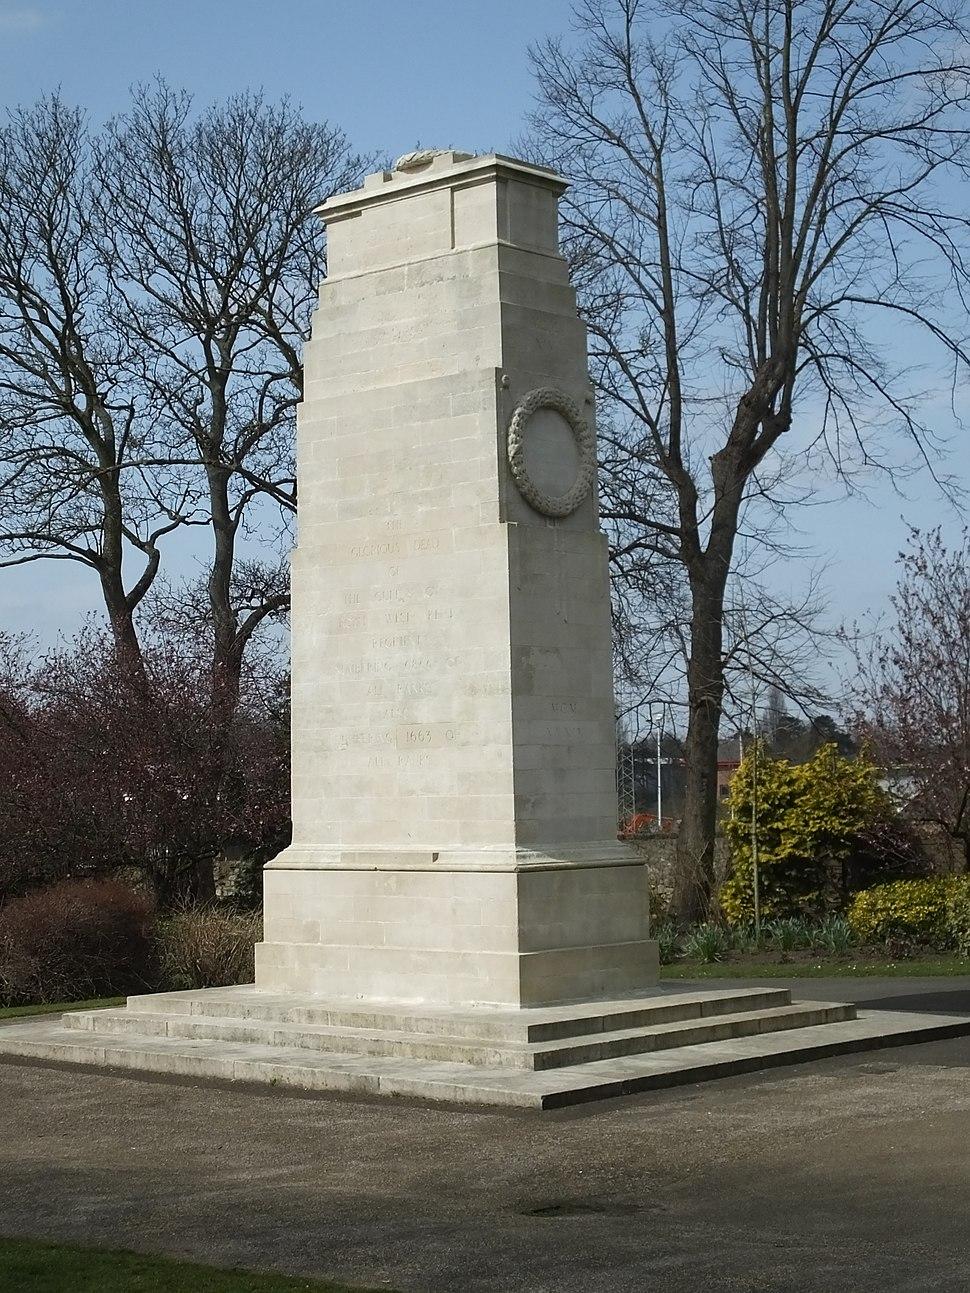 Brenchley Gardens Cenotaph 0097